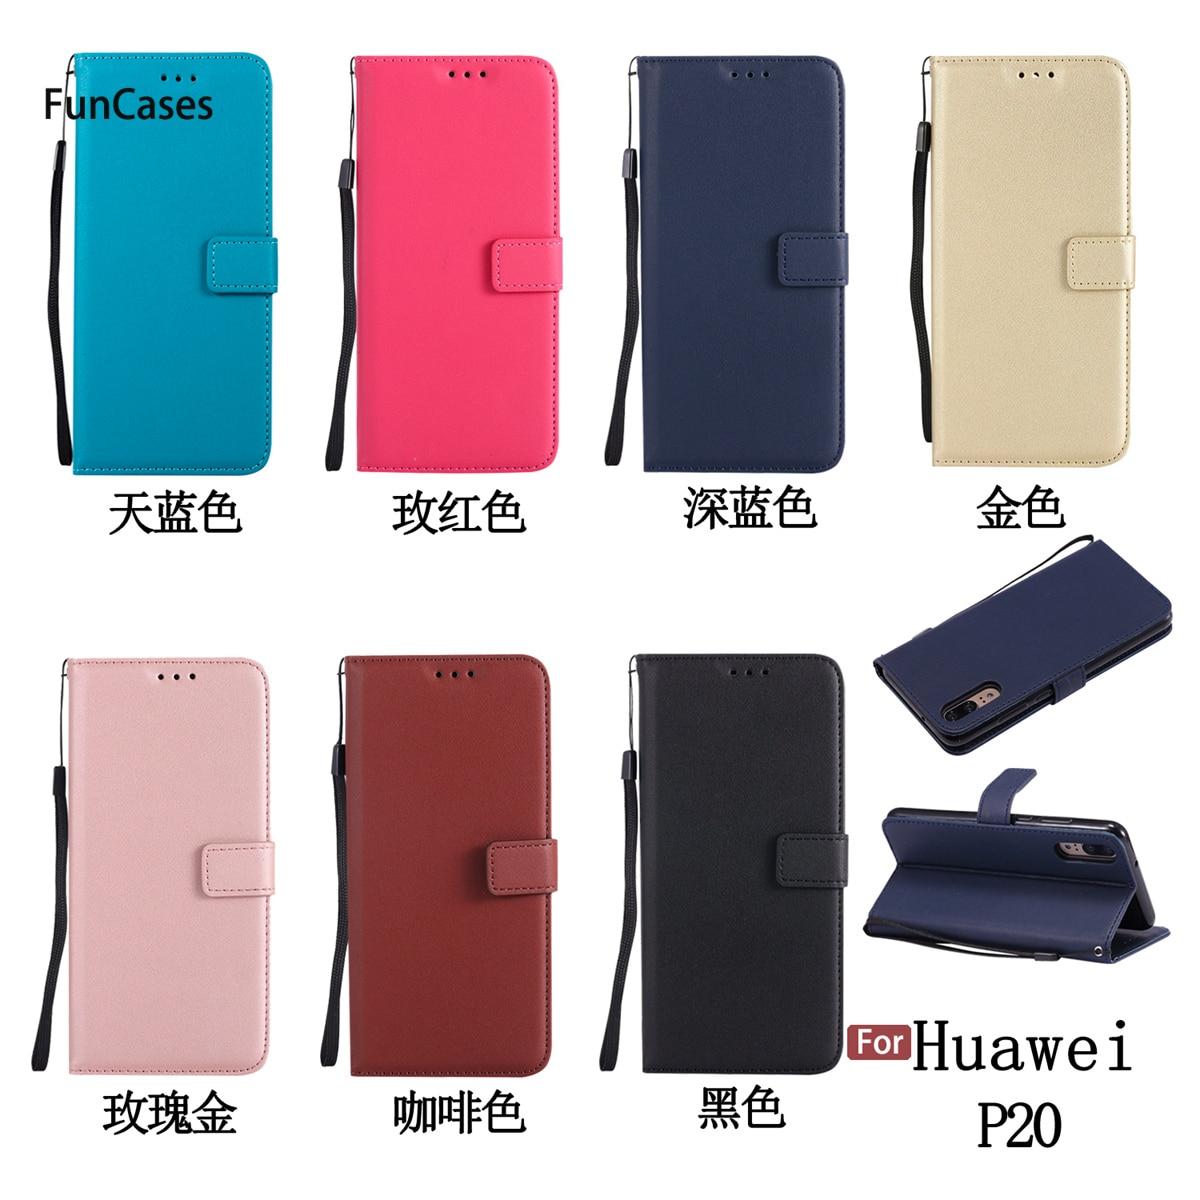 Newest PU Leather Case sFor Ajax Huawei P20 Bracket Case Wonderful Squishy Back Cover For Huawei Ascend P20 Plastic Funda Pho Ne